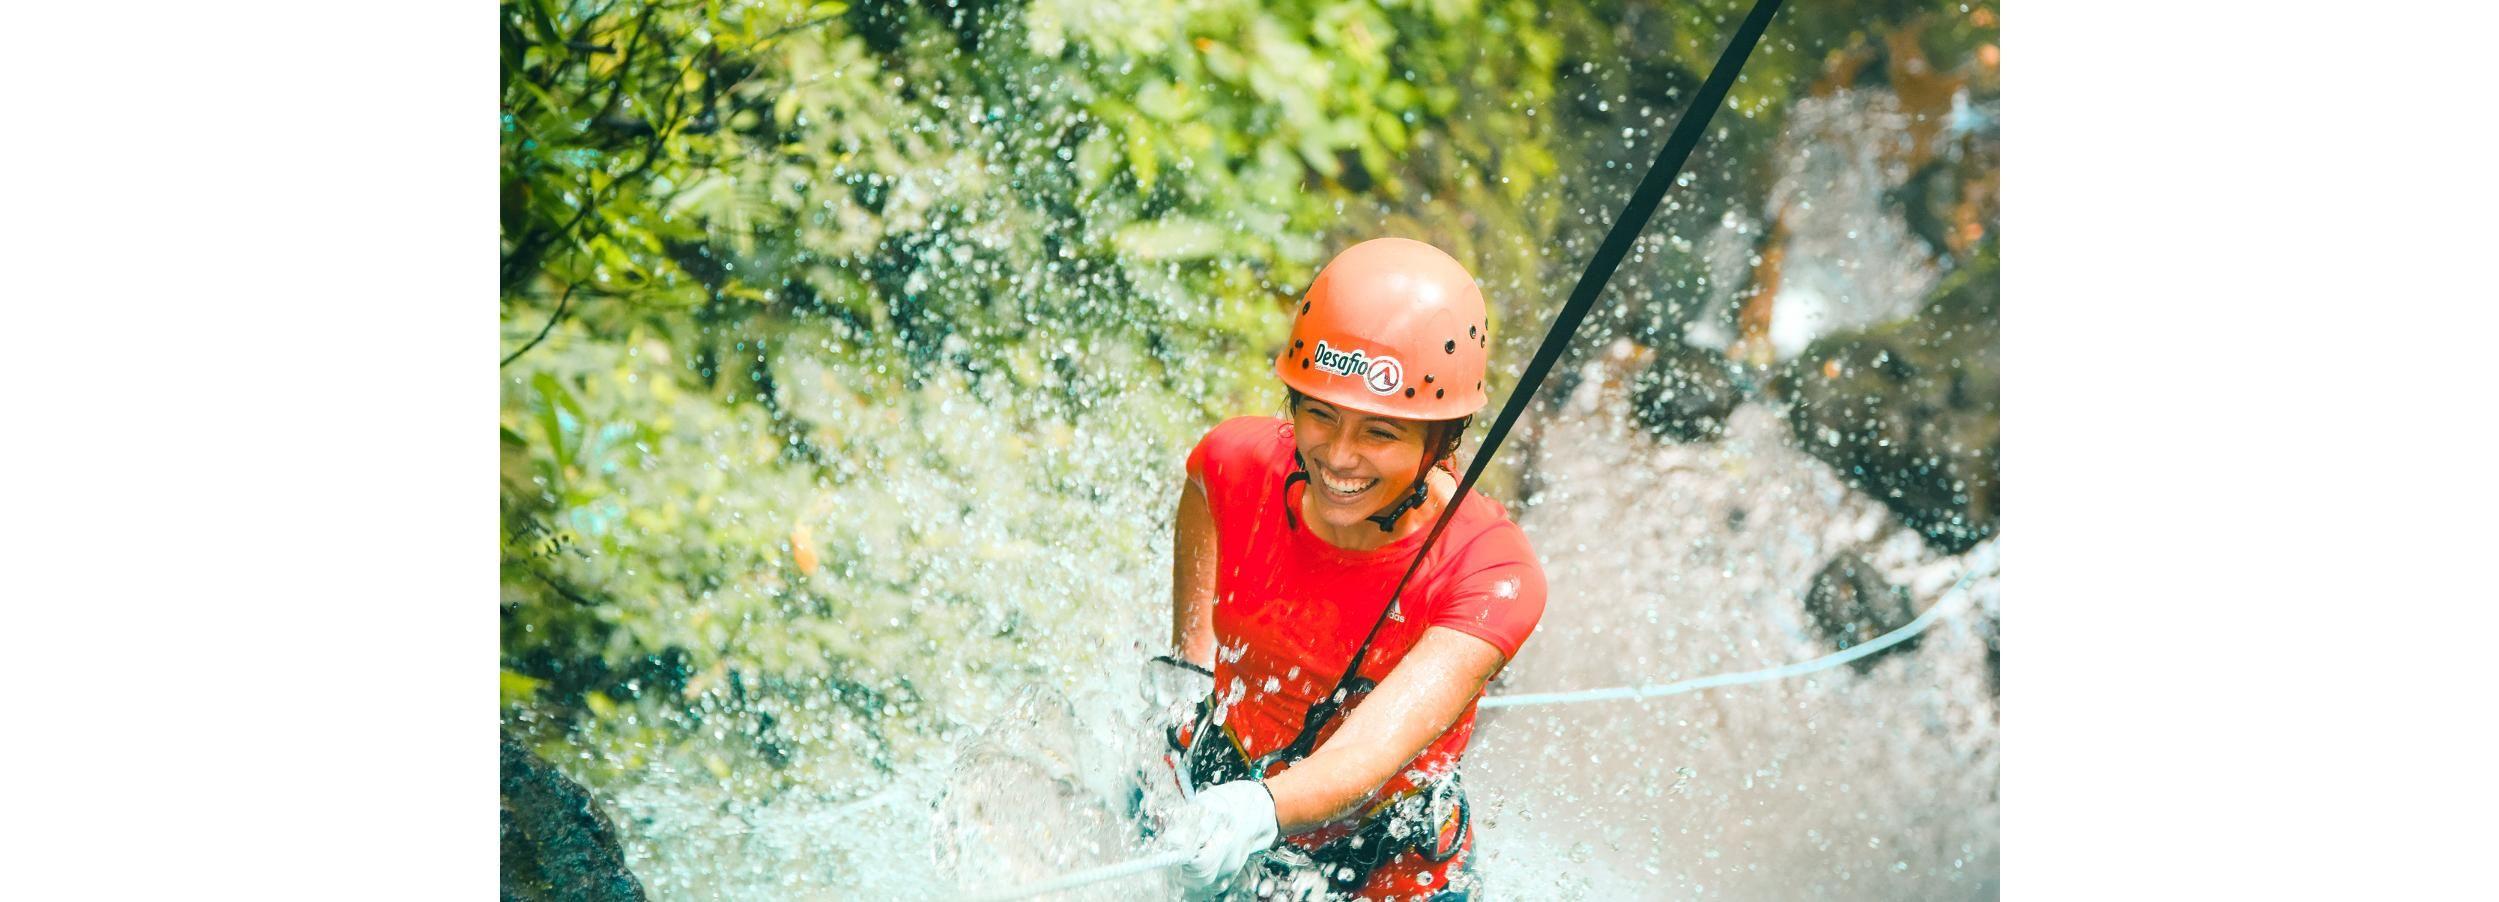 Vulkan Arenal: Canyoneering-Abenteuer in einer Schlucht